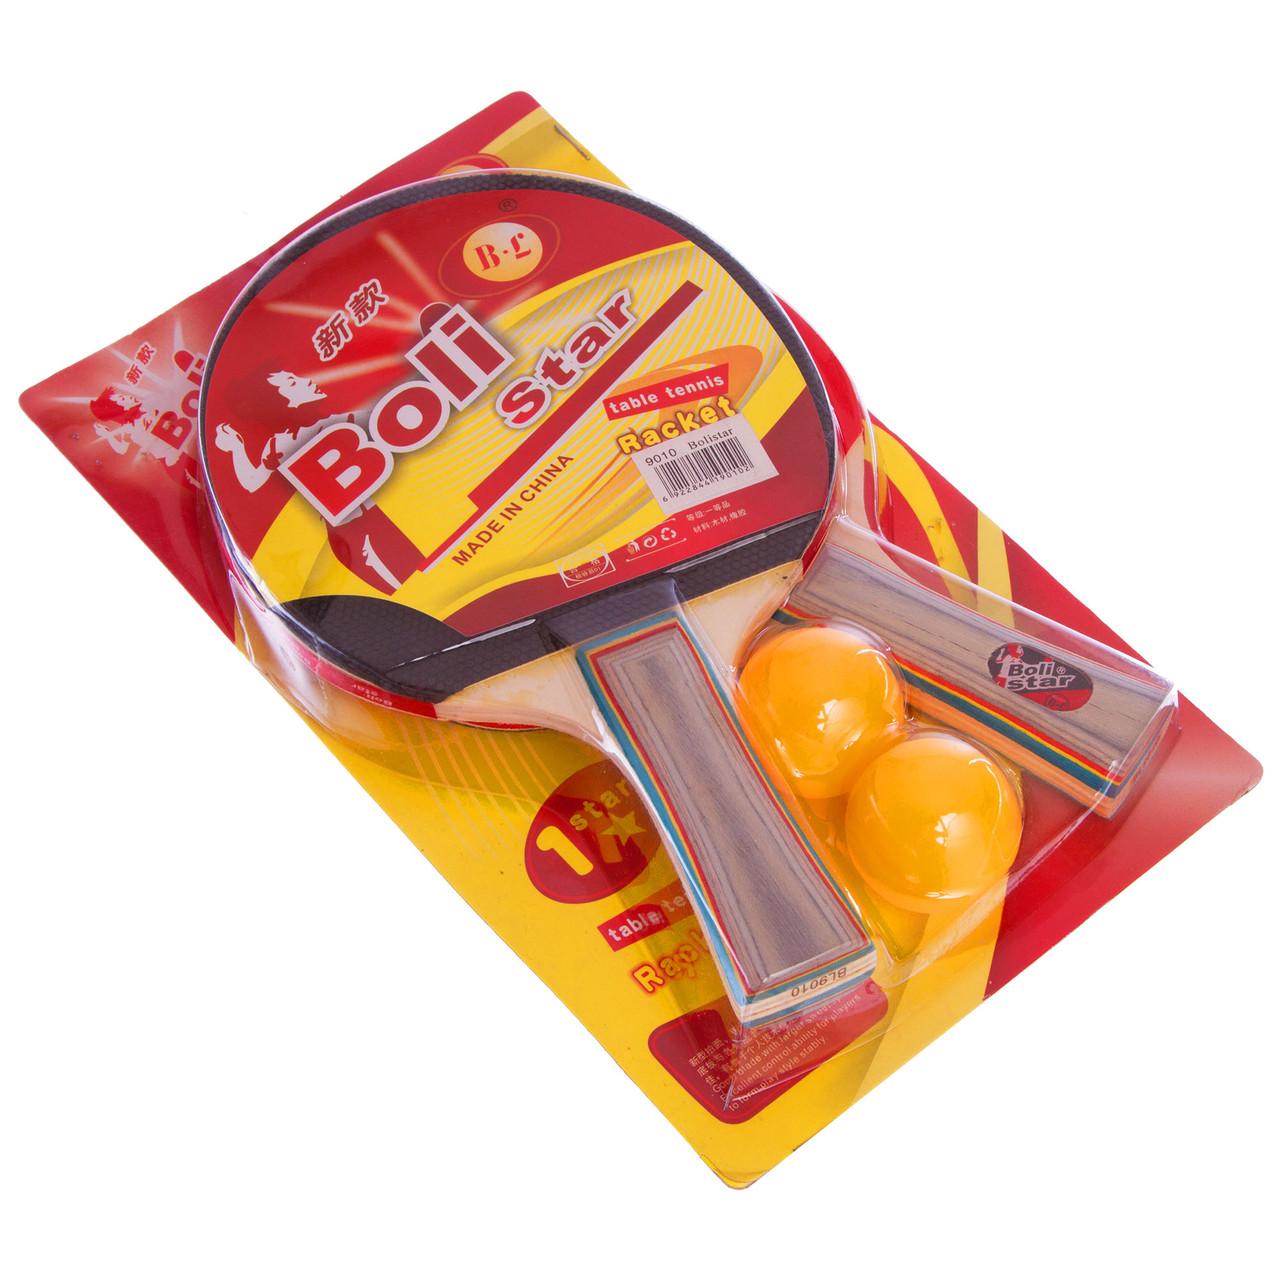 Комплект для настольного тенниса 2 ракетки 2 мяча Boli prince MT-9010